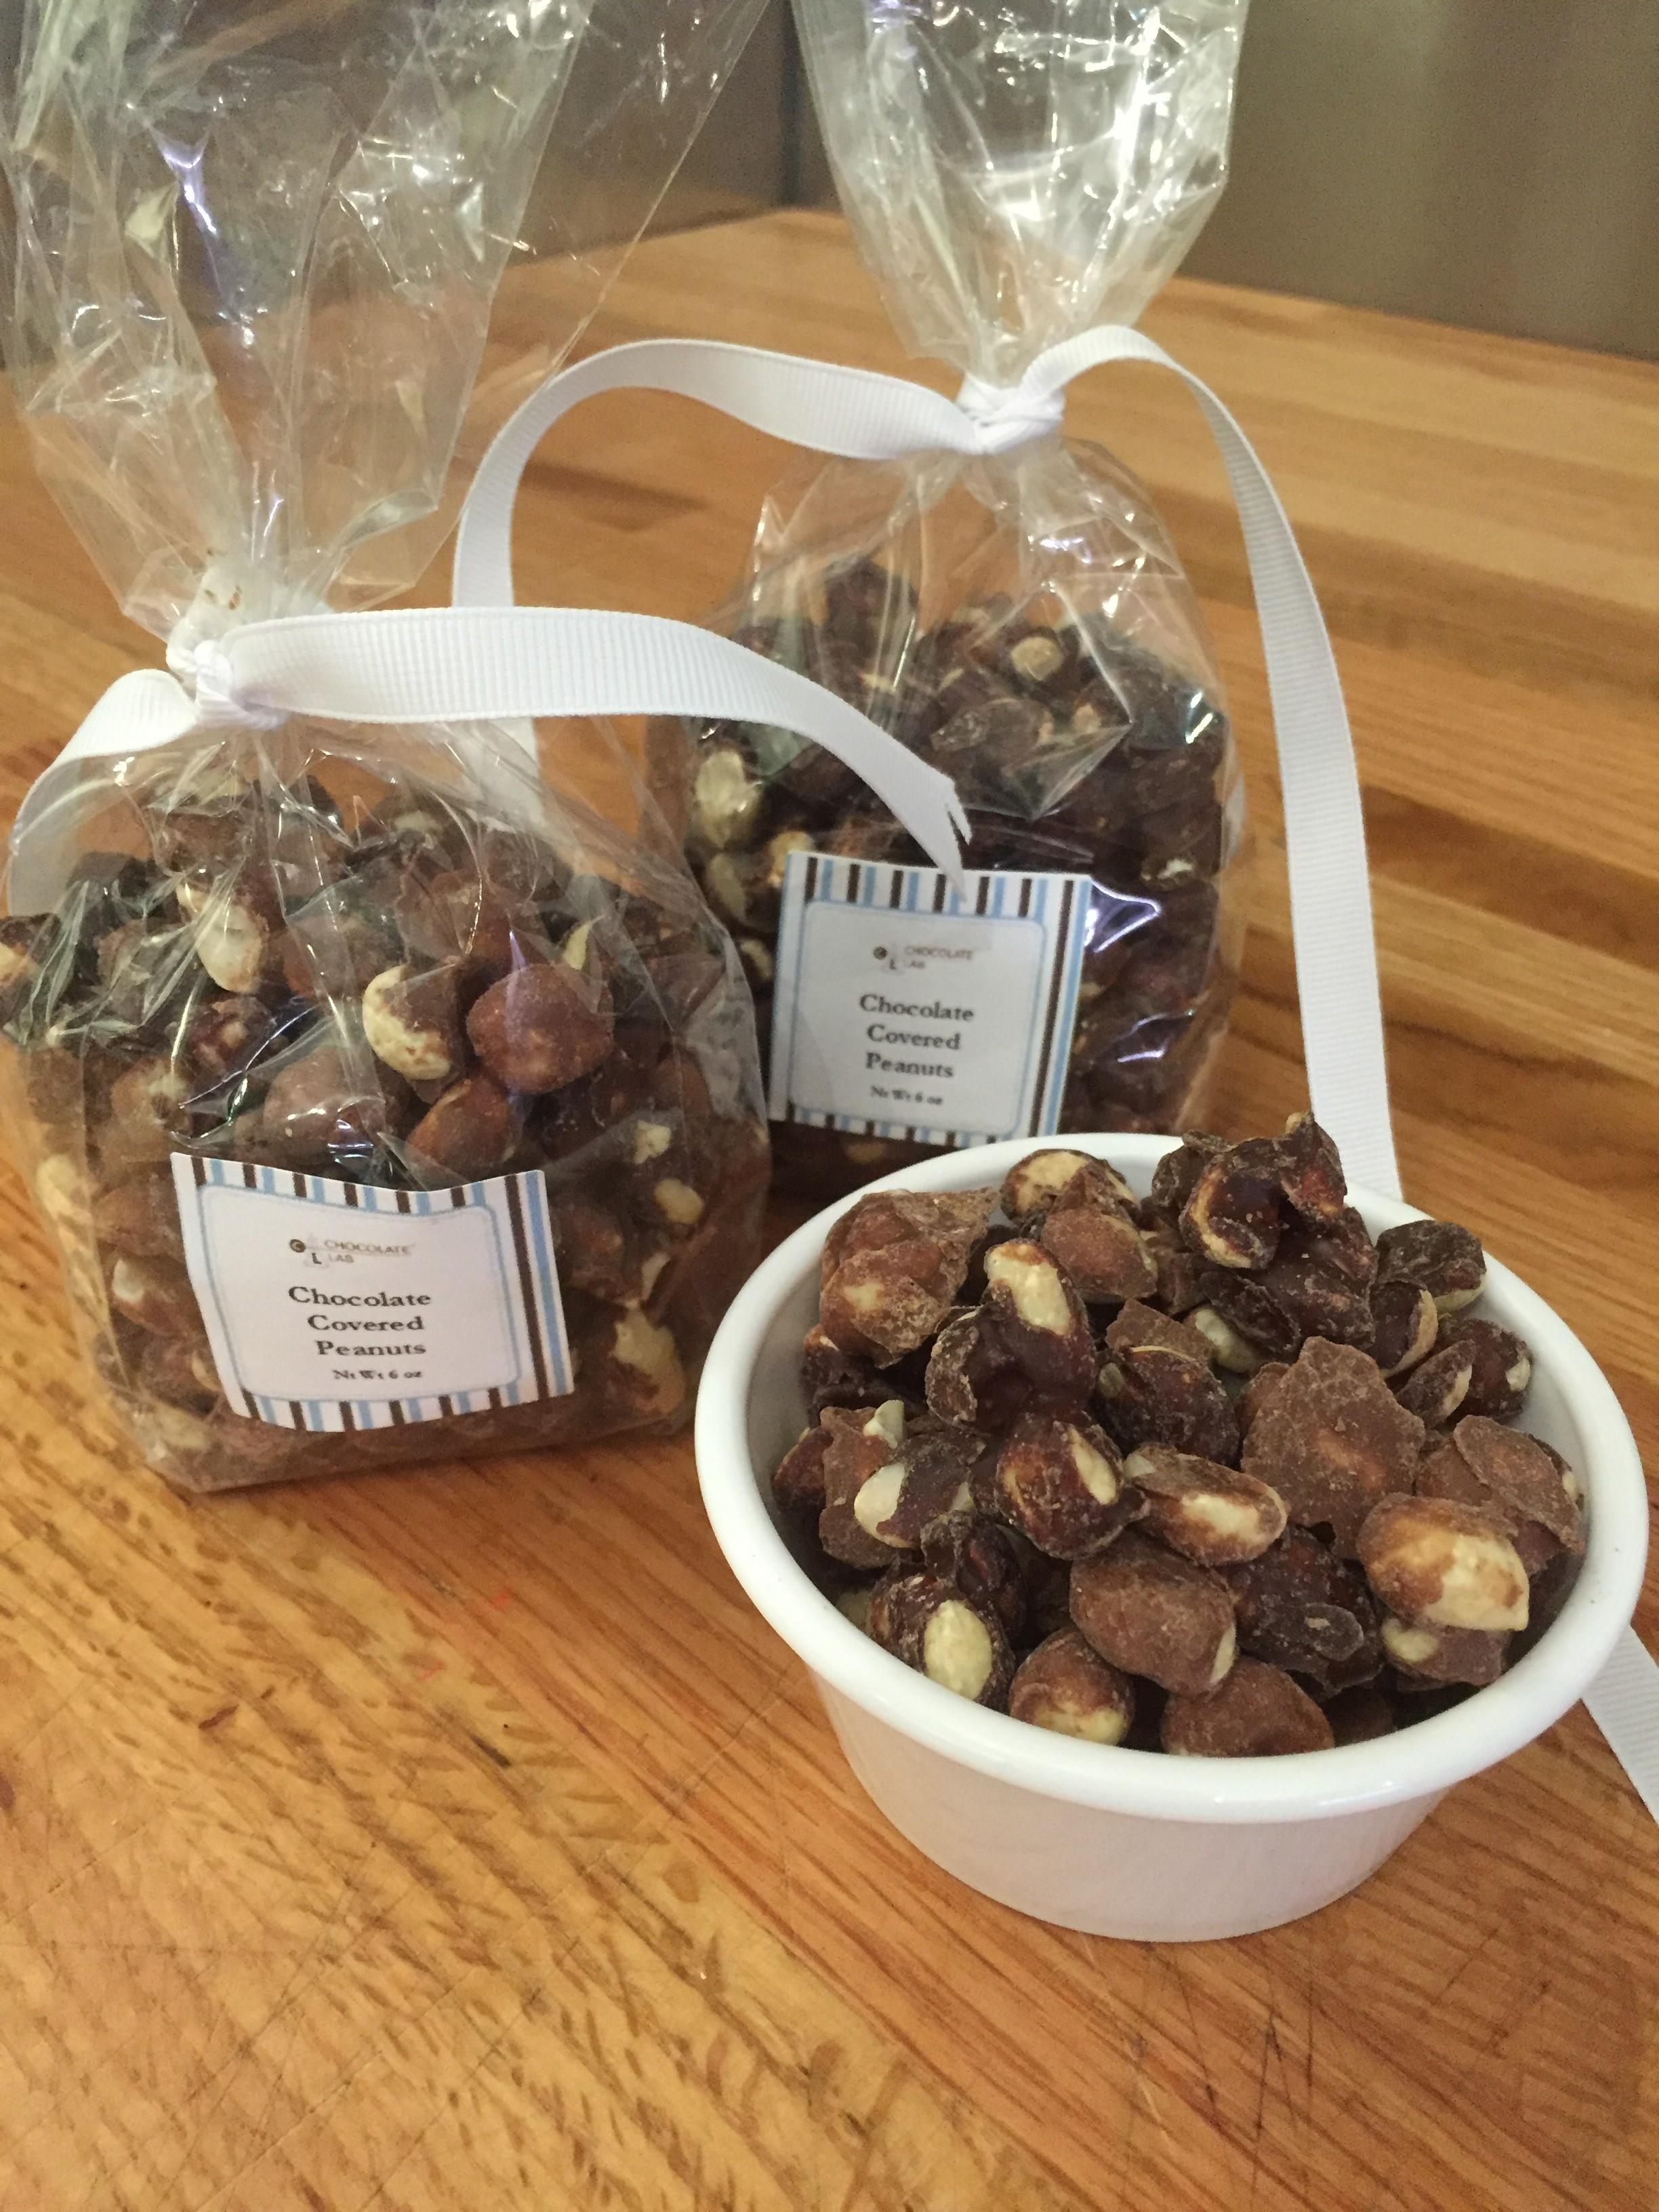 Chocolate Lab Denver – Denver's Premier Chocolates